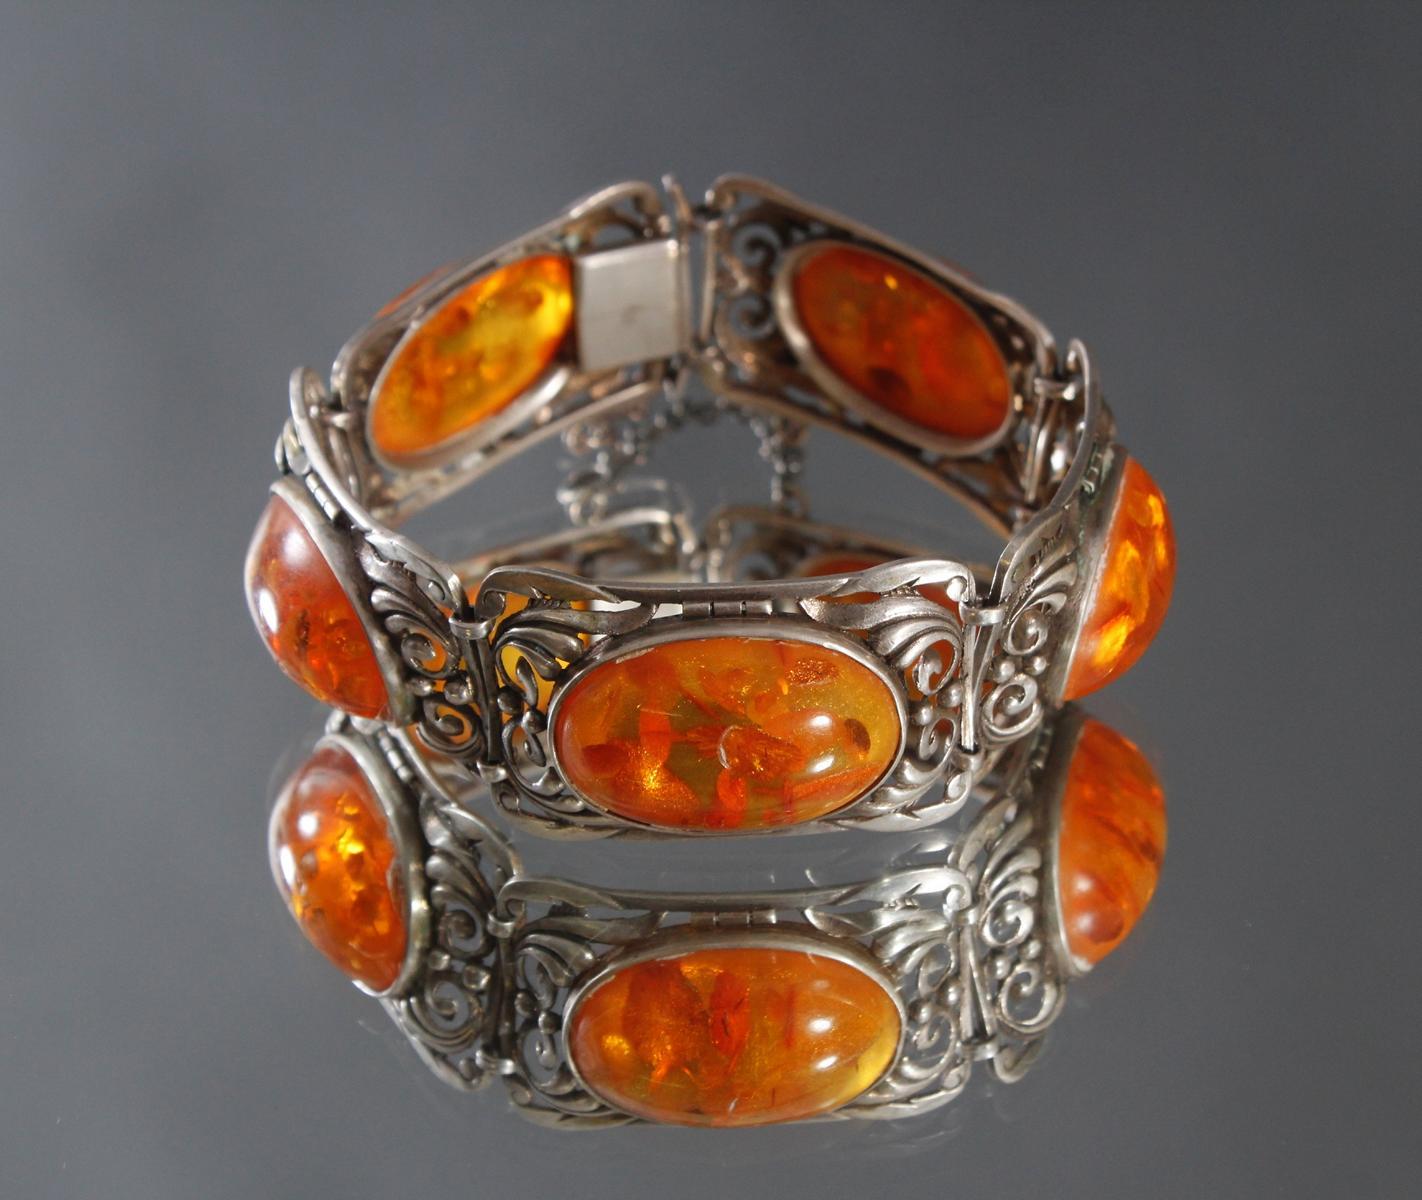 Antikes Silberarmband mit Bernsteincabochons